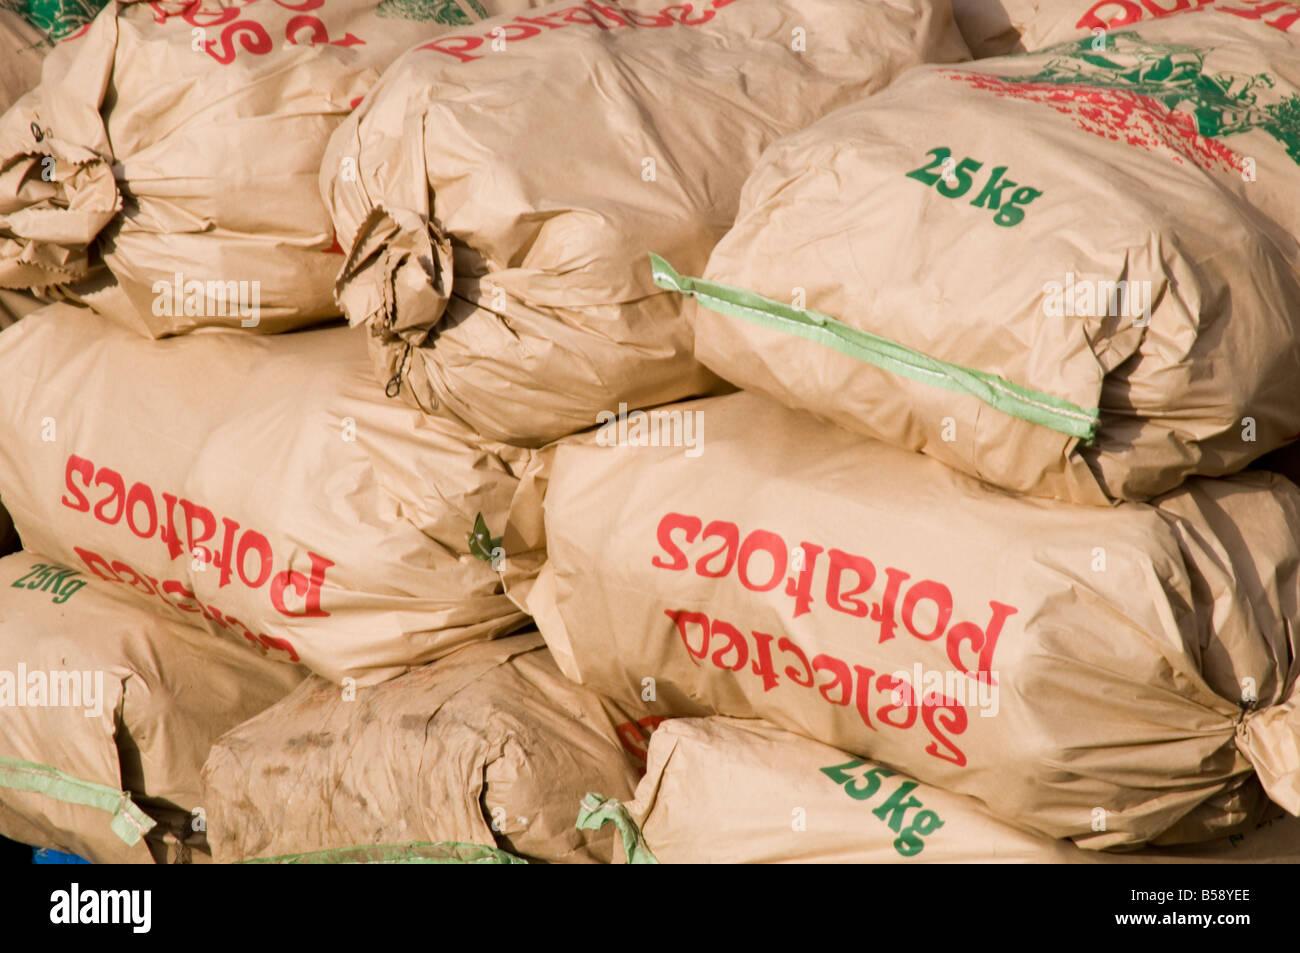 sack of potatoes spud spuds potato bag bags sacks food paper packaging market - Stock Image